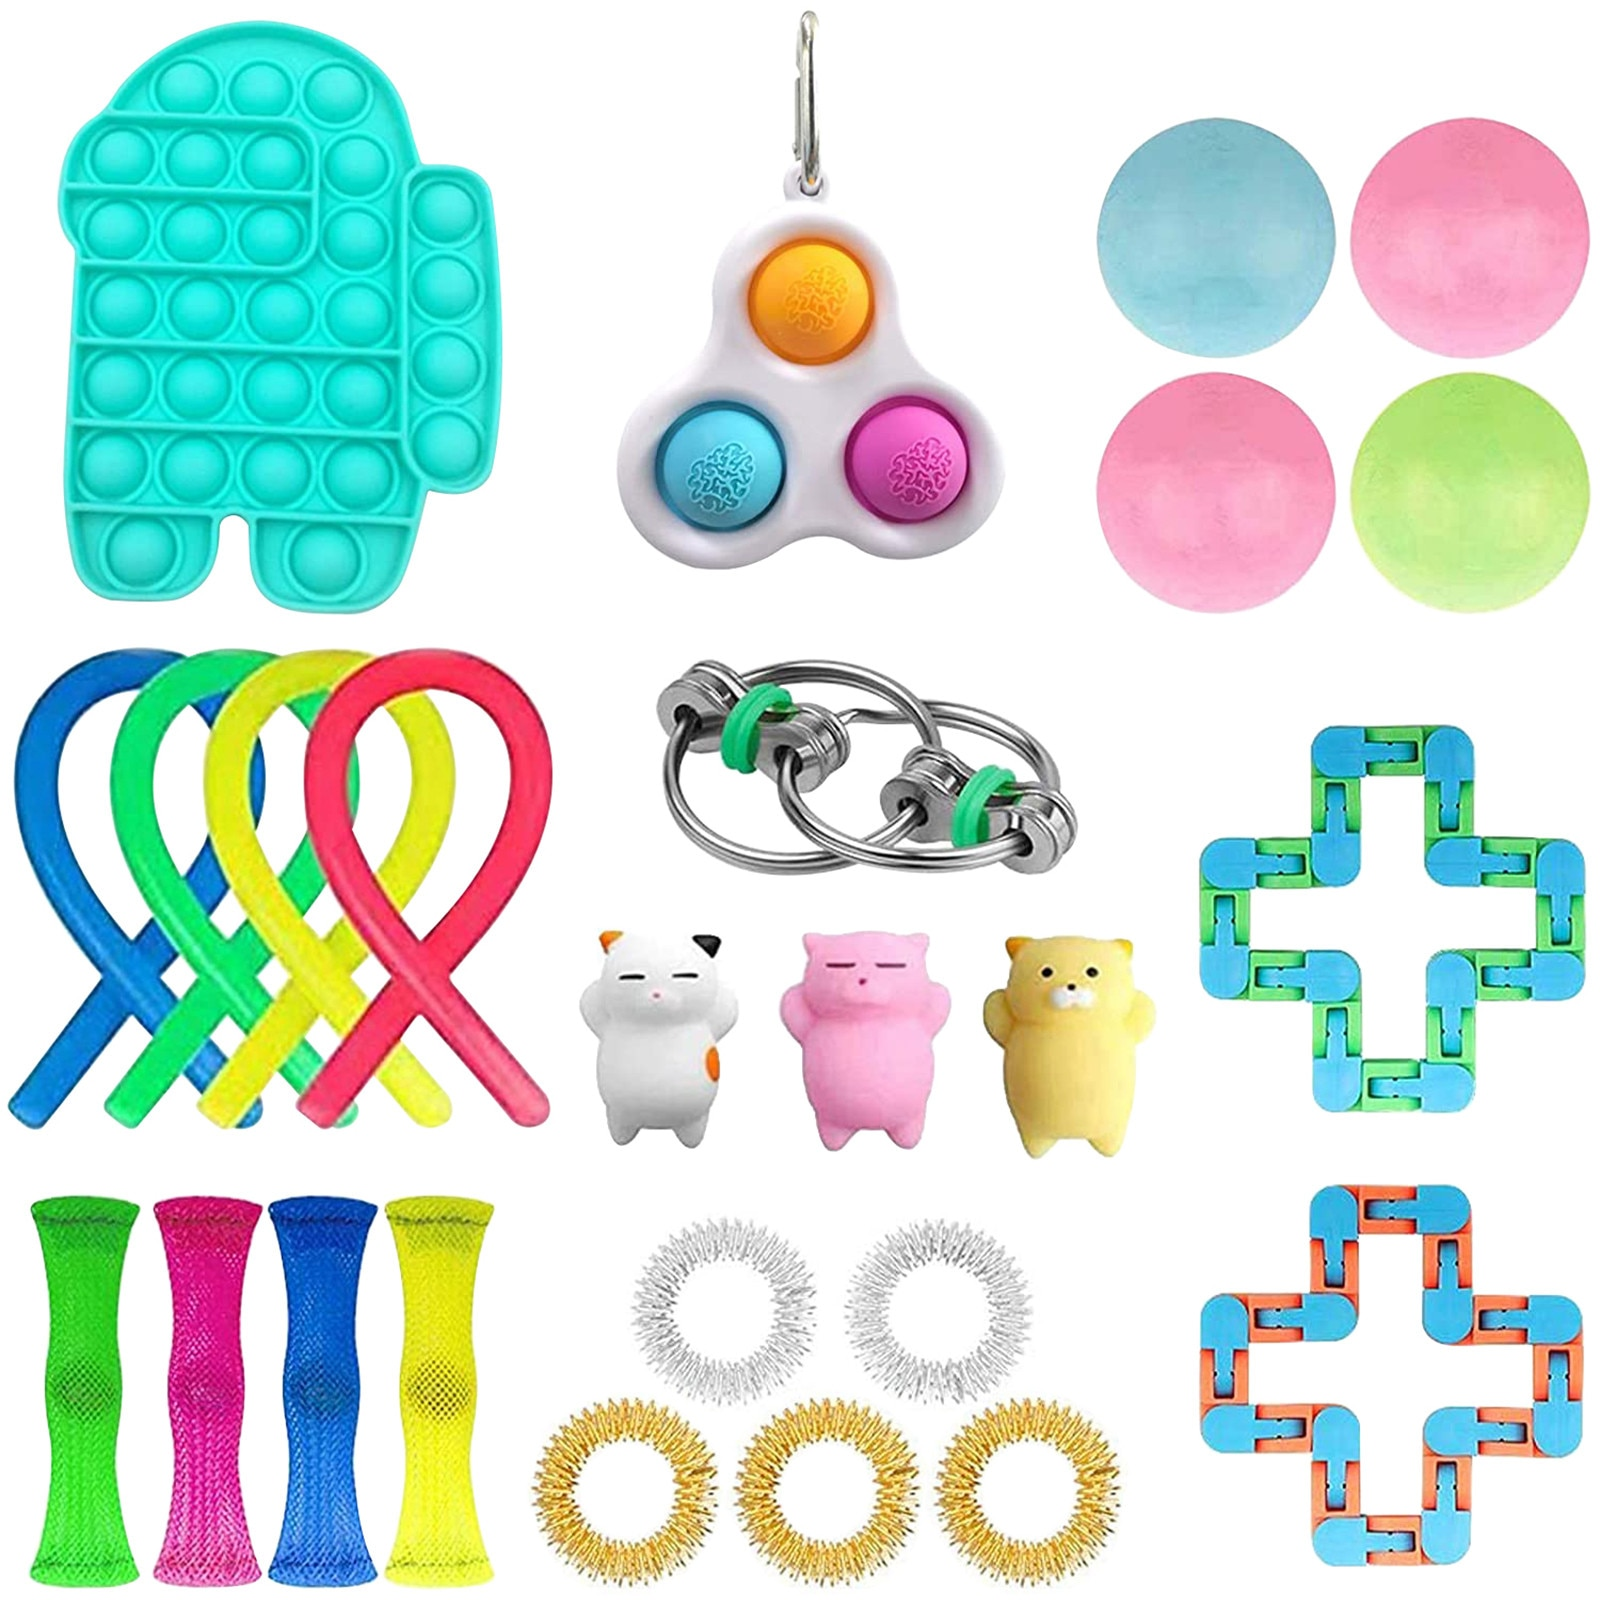 25PCS Toy Set Cheap Sensory Toys Pack for Kids or Adults Figetget Toys Pack Figit Toys Set Edc Stress Relief Push Bubble Fidget enlarge